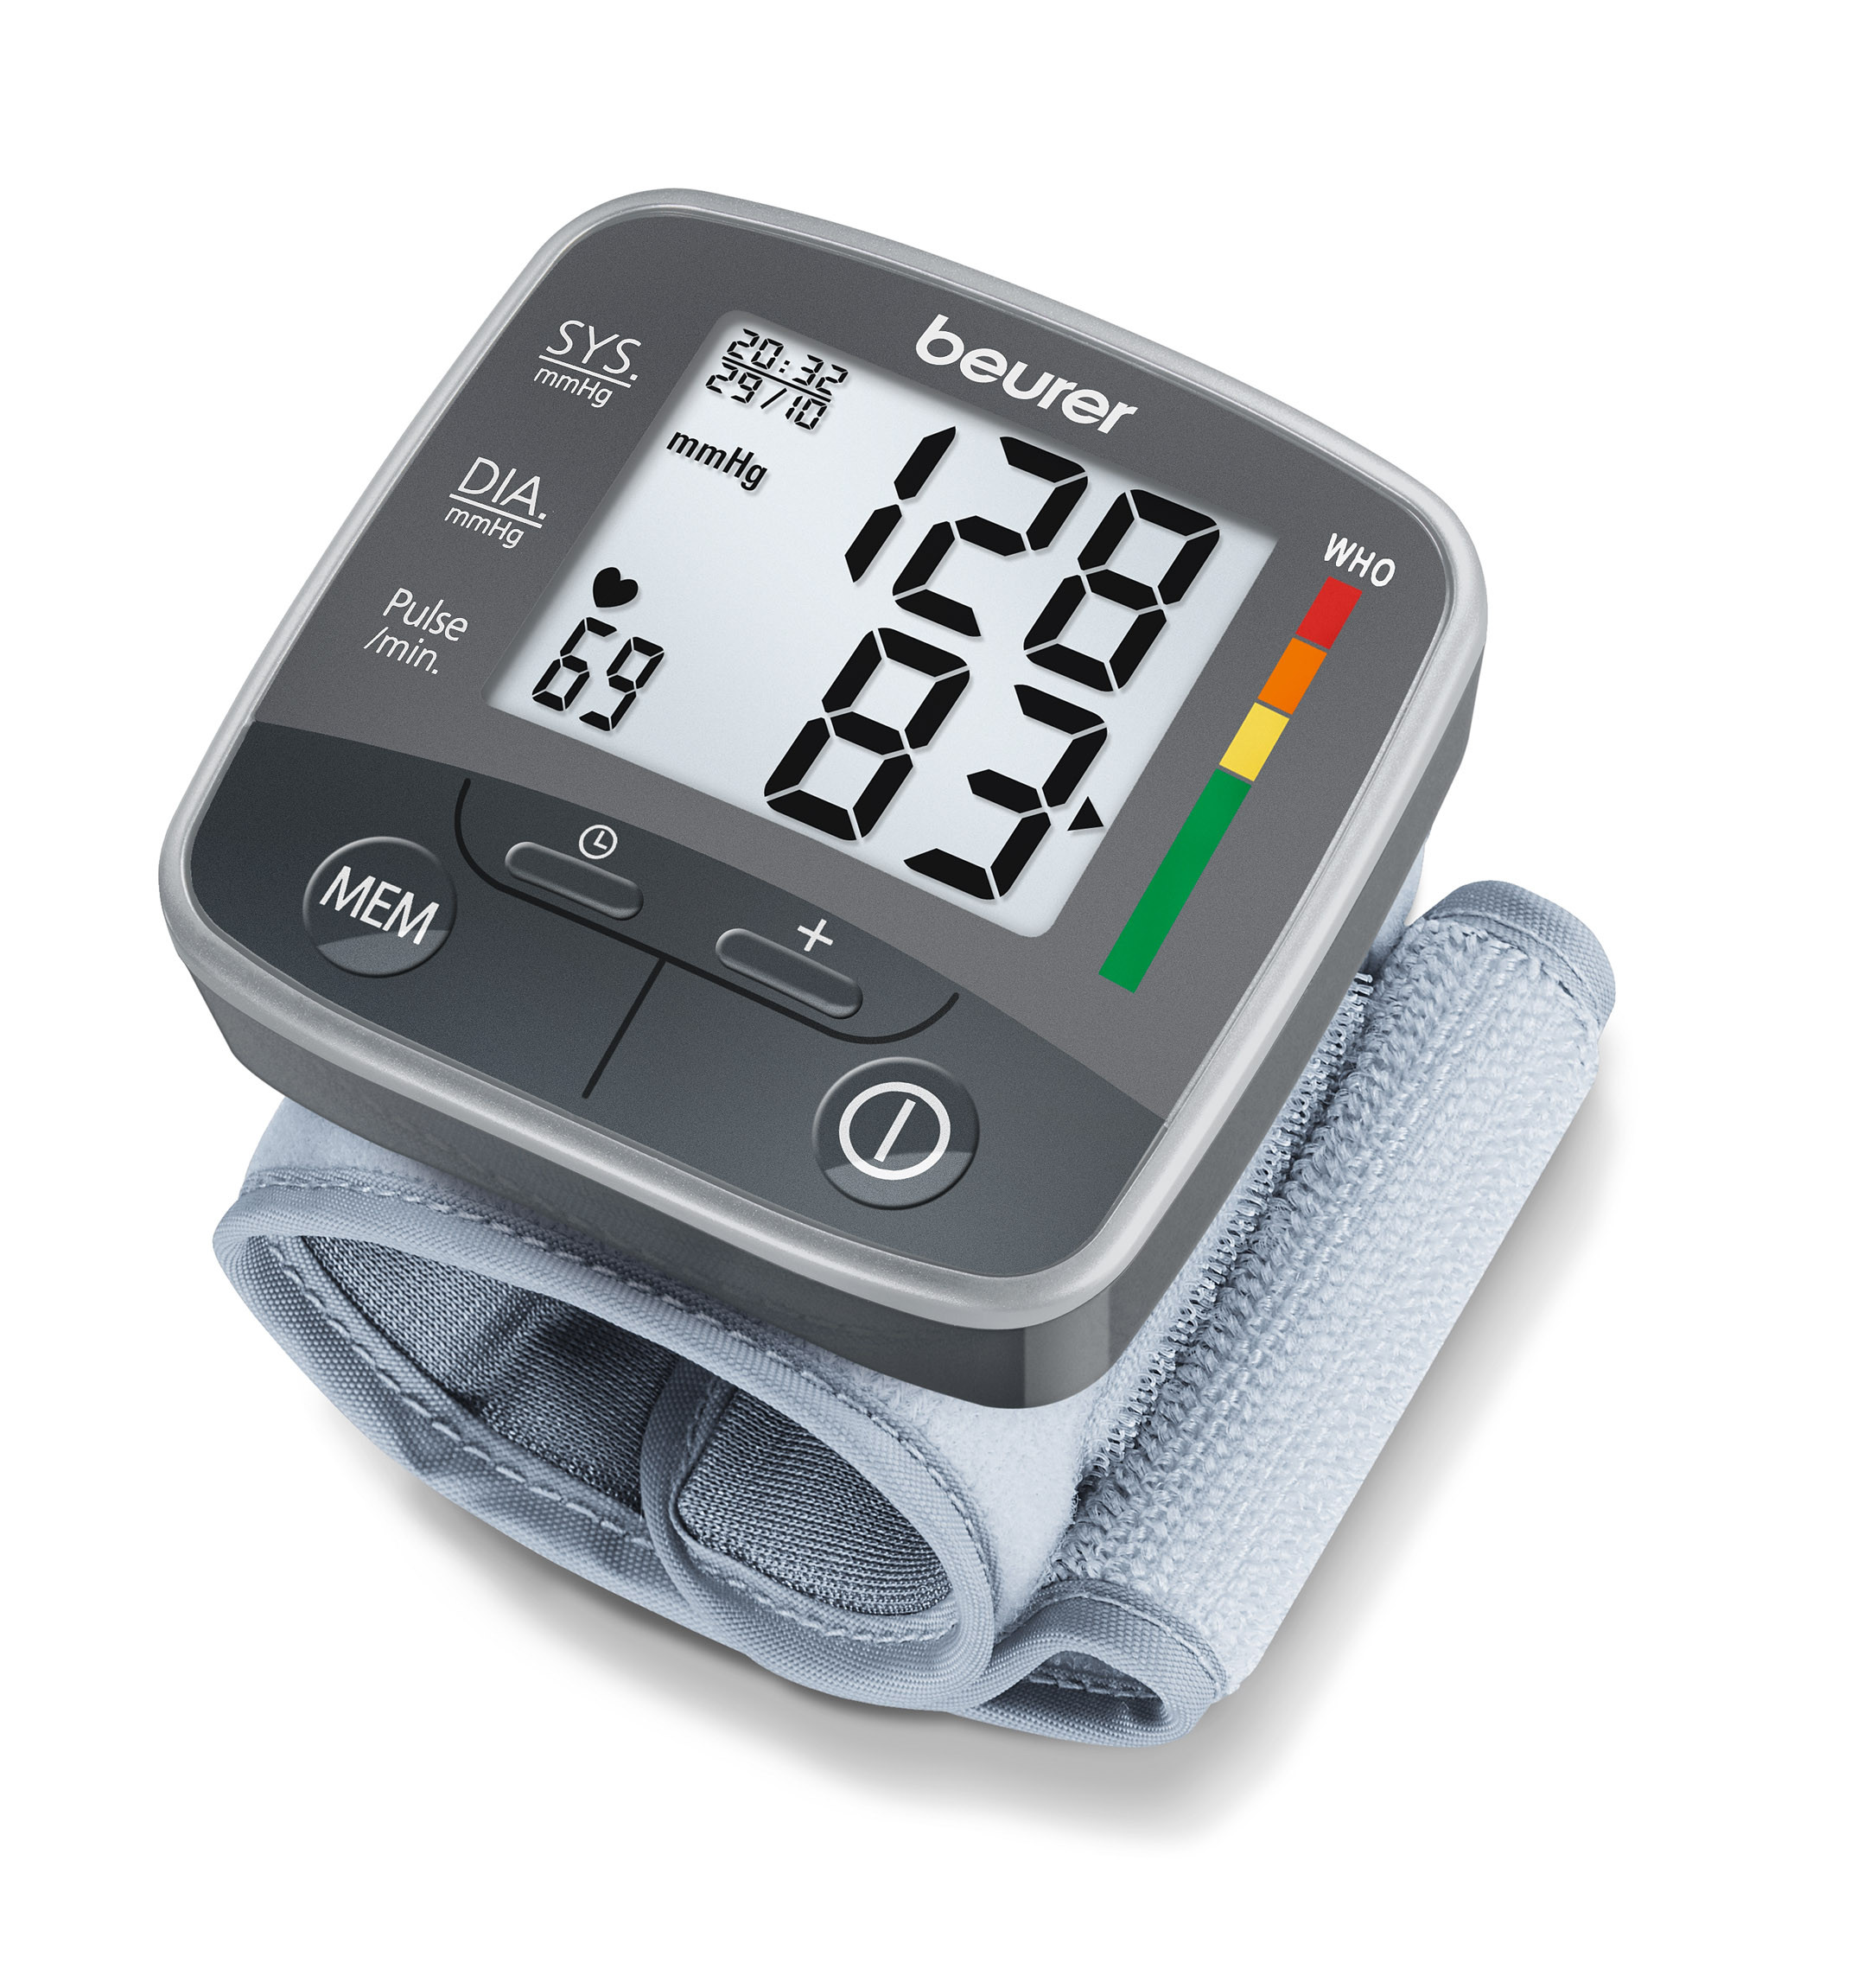 BC32 Blodtryksmåler til håndled, WHO indikator